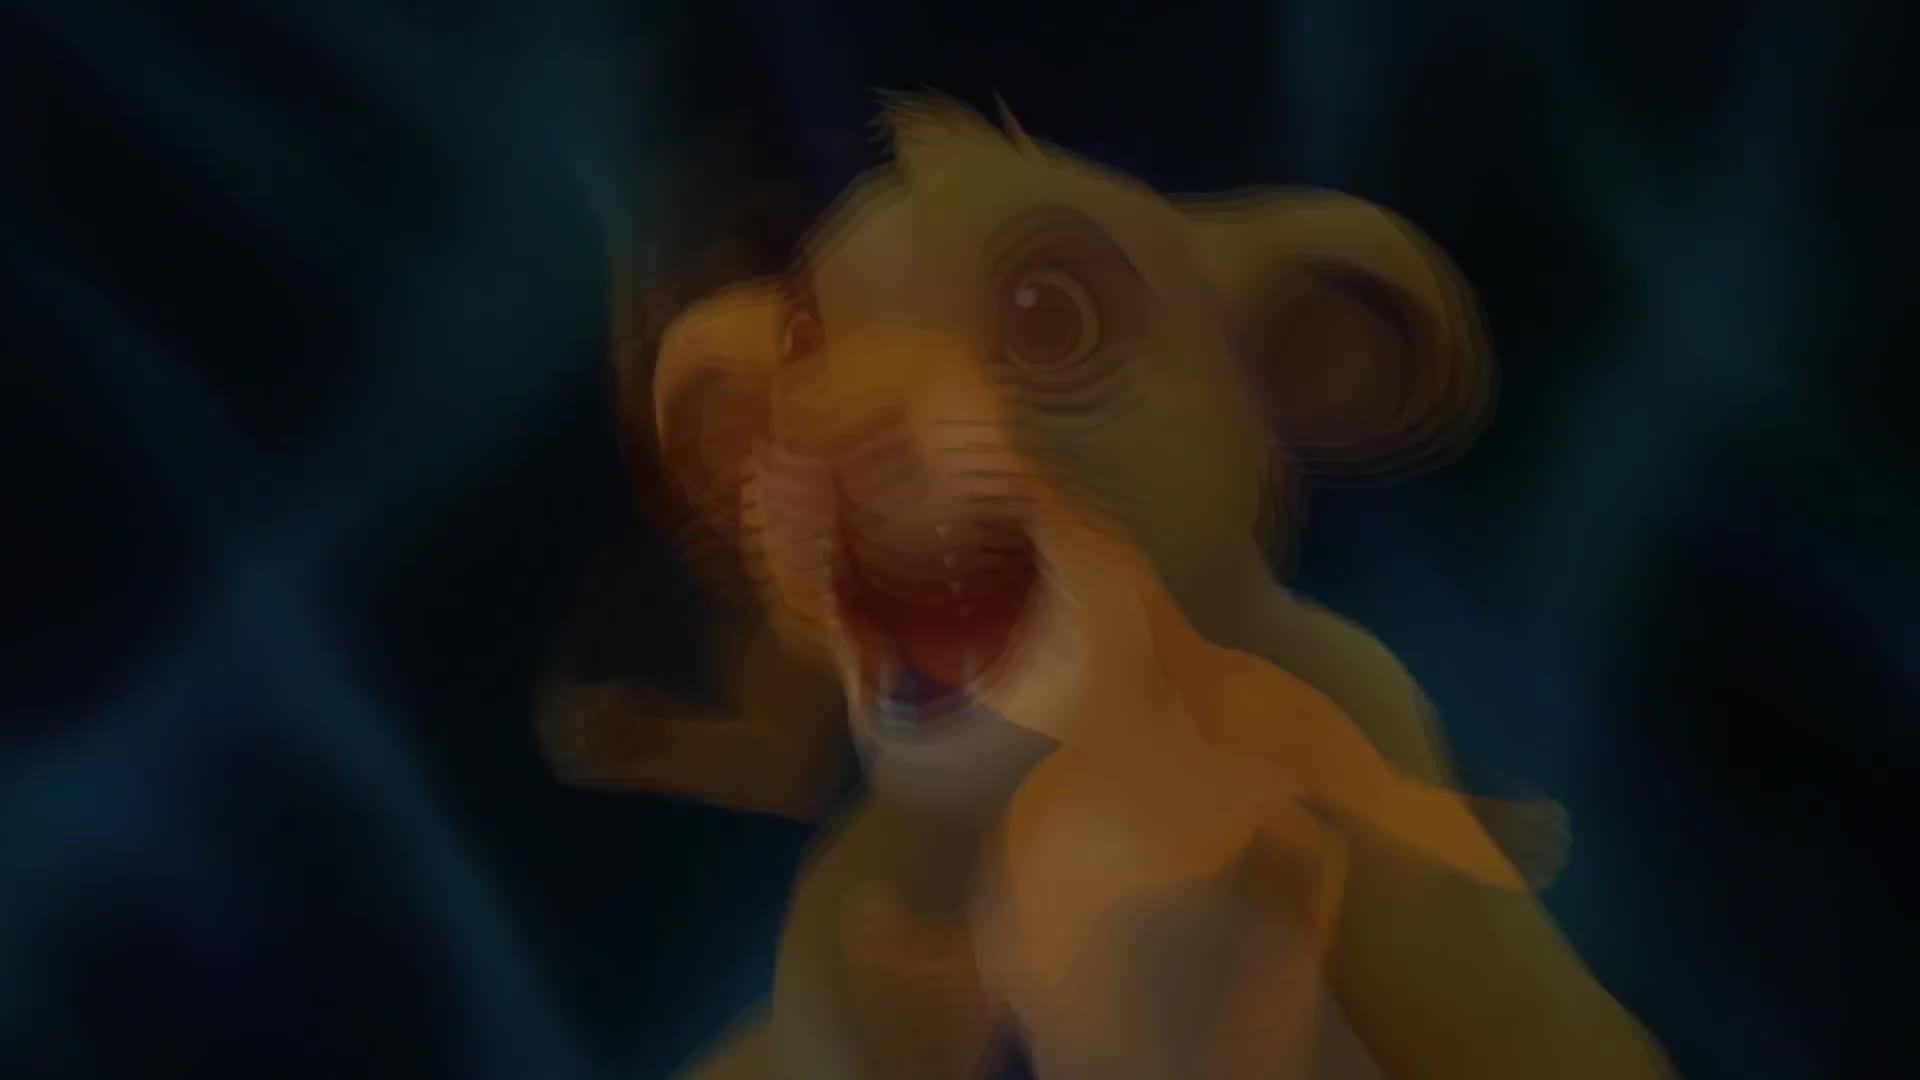 Kingdom Hearts 2 Hd Final Mix Movie 60fps 1080p Gif - Lion King Kingdom Hearts Gif , HD Wallpaper & Backgrounds